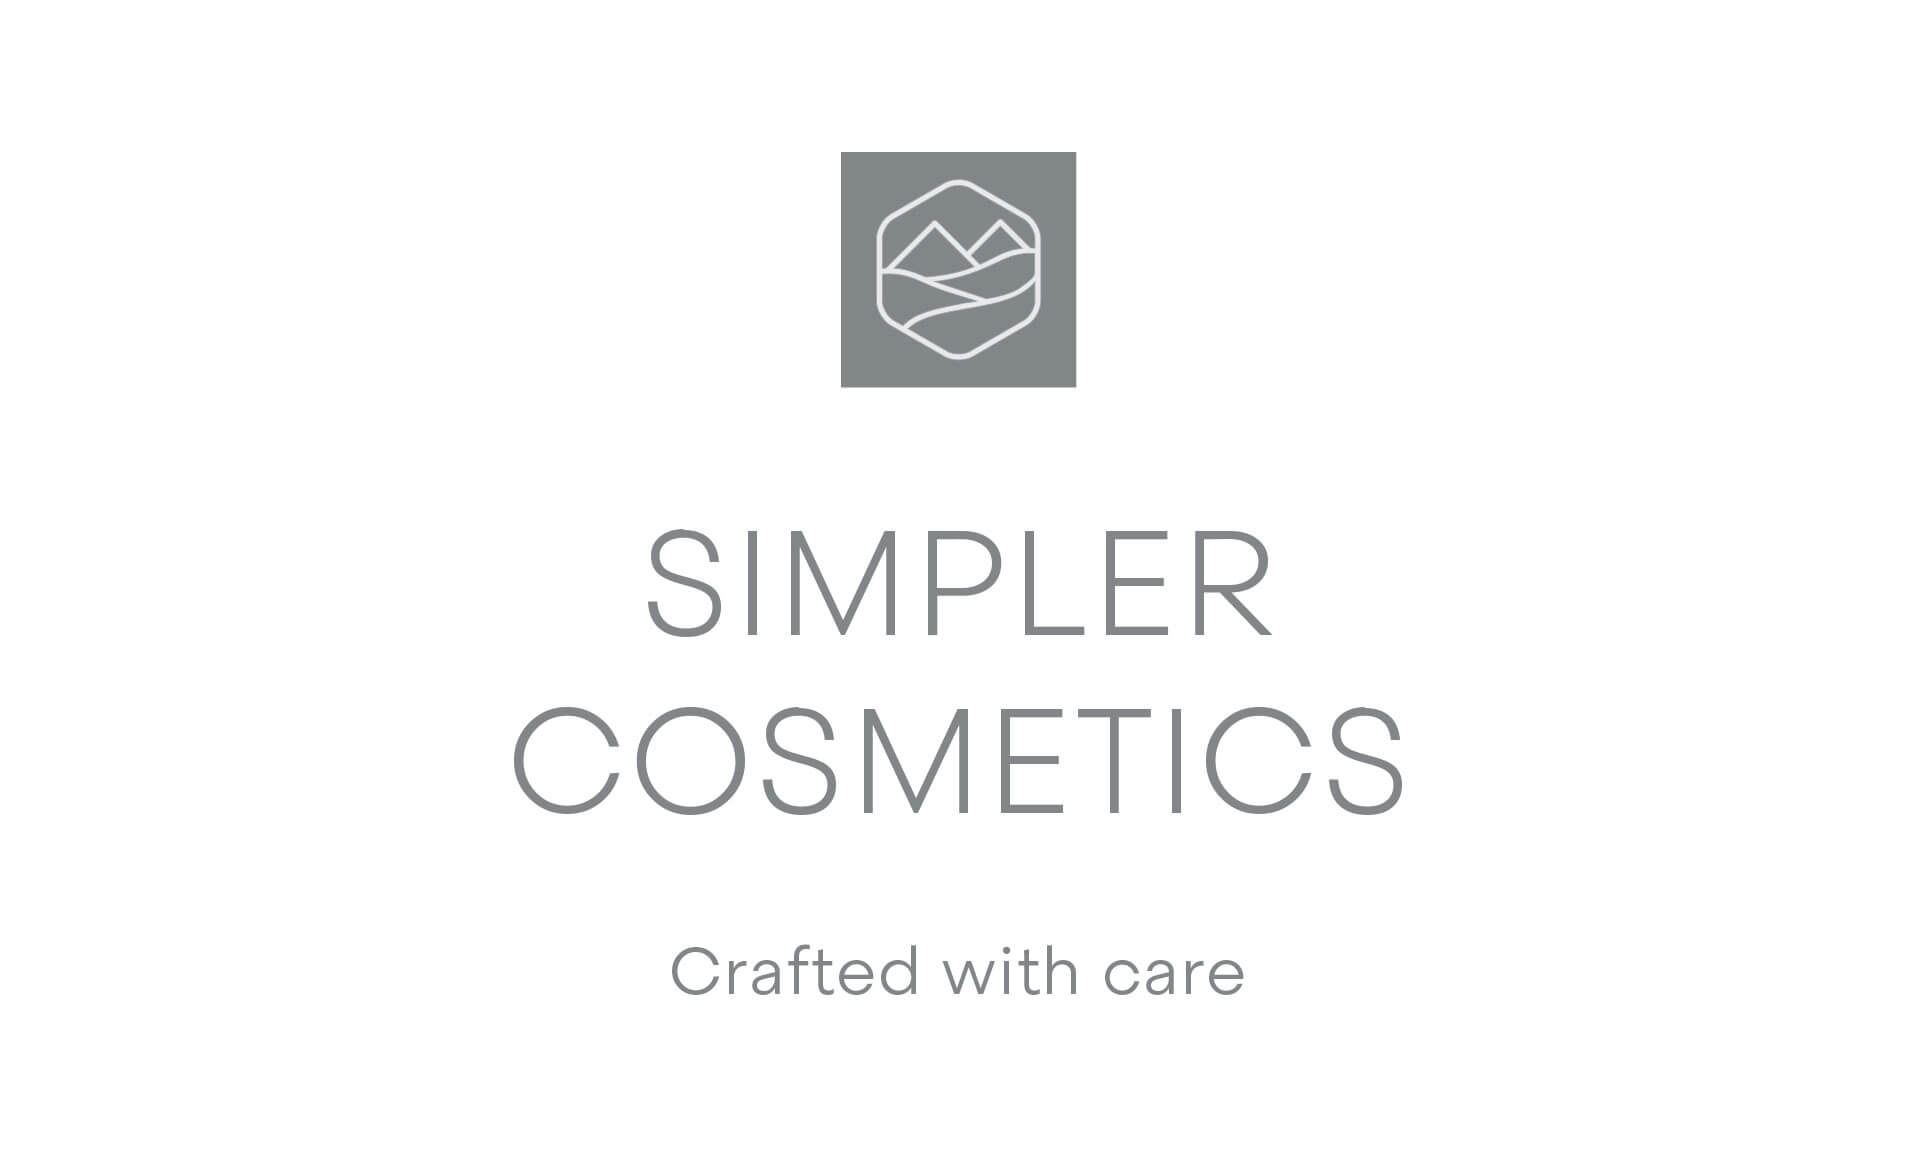 Simpler Cosmetics